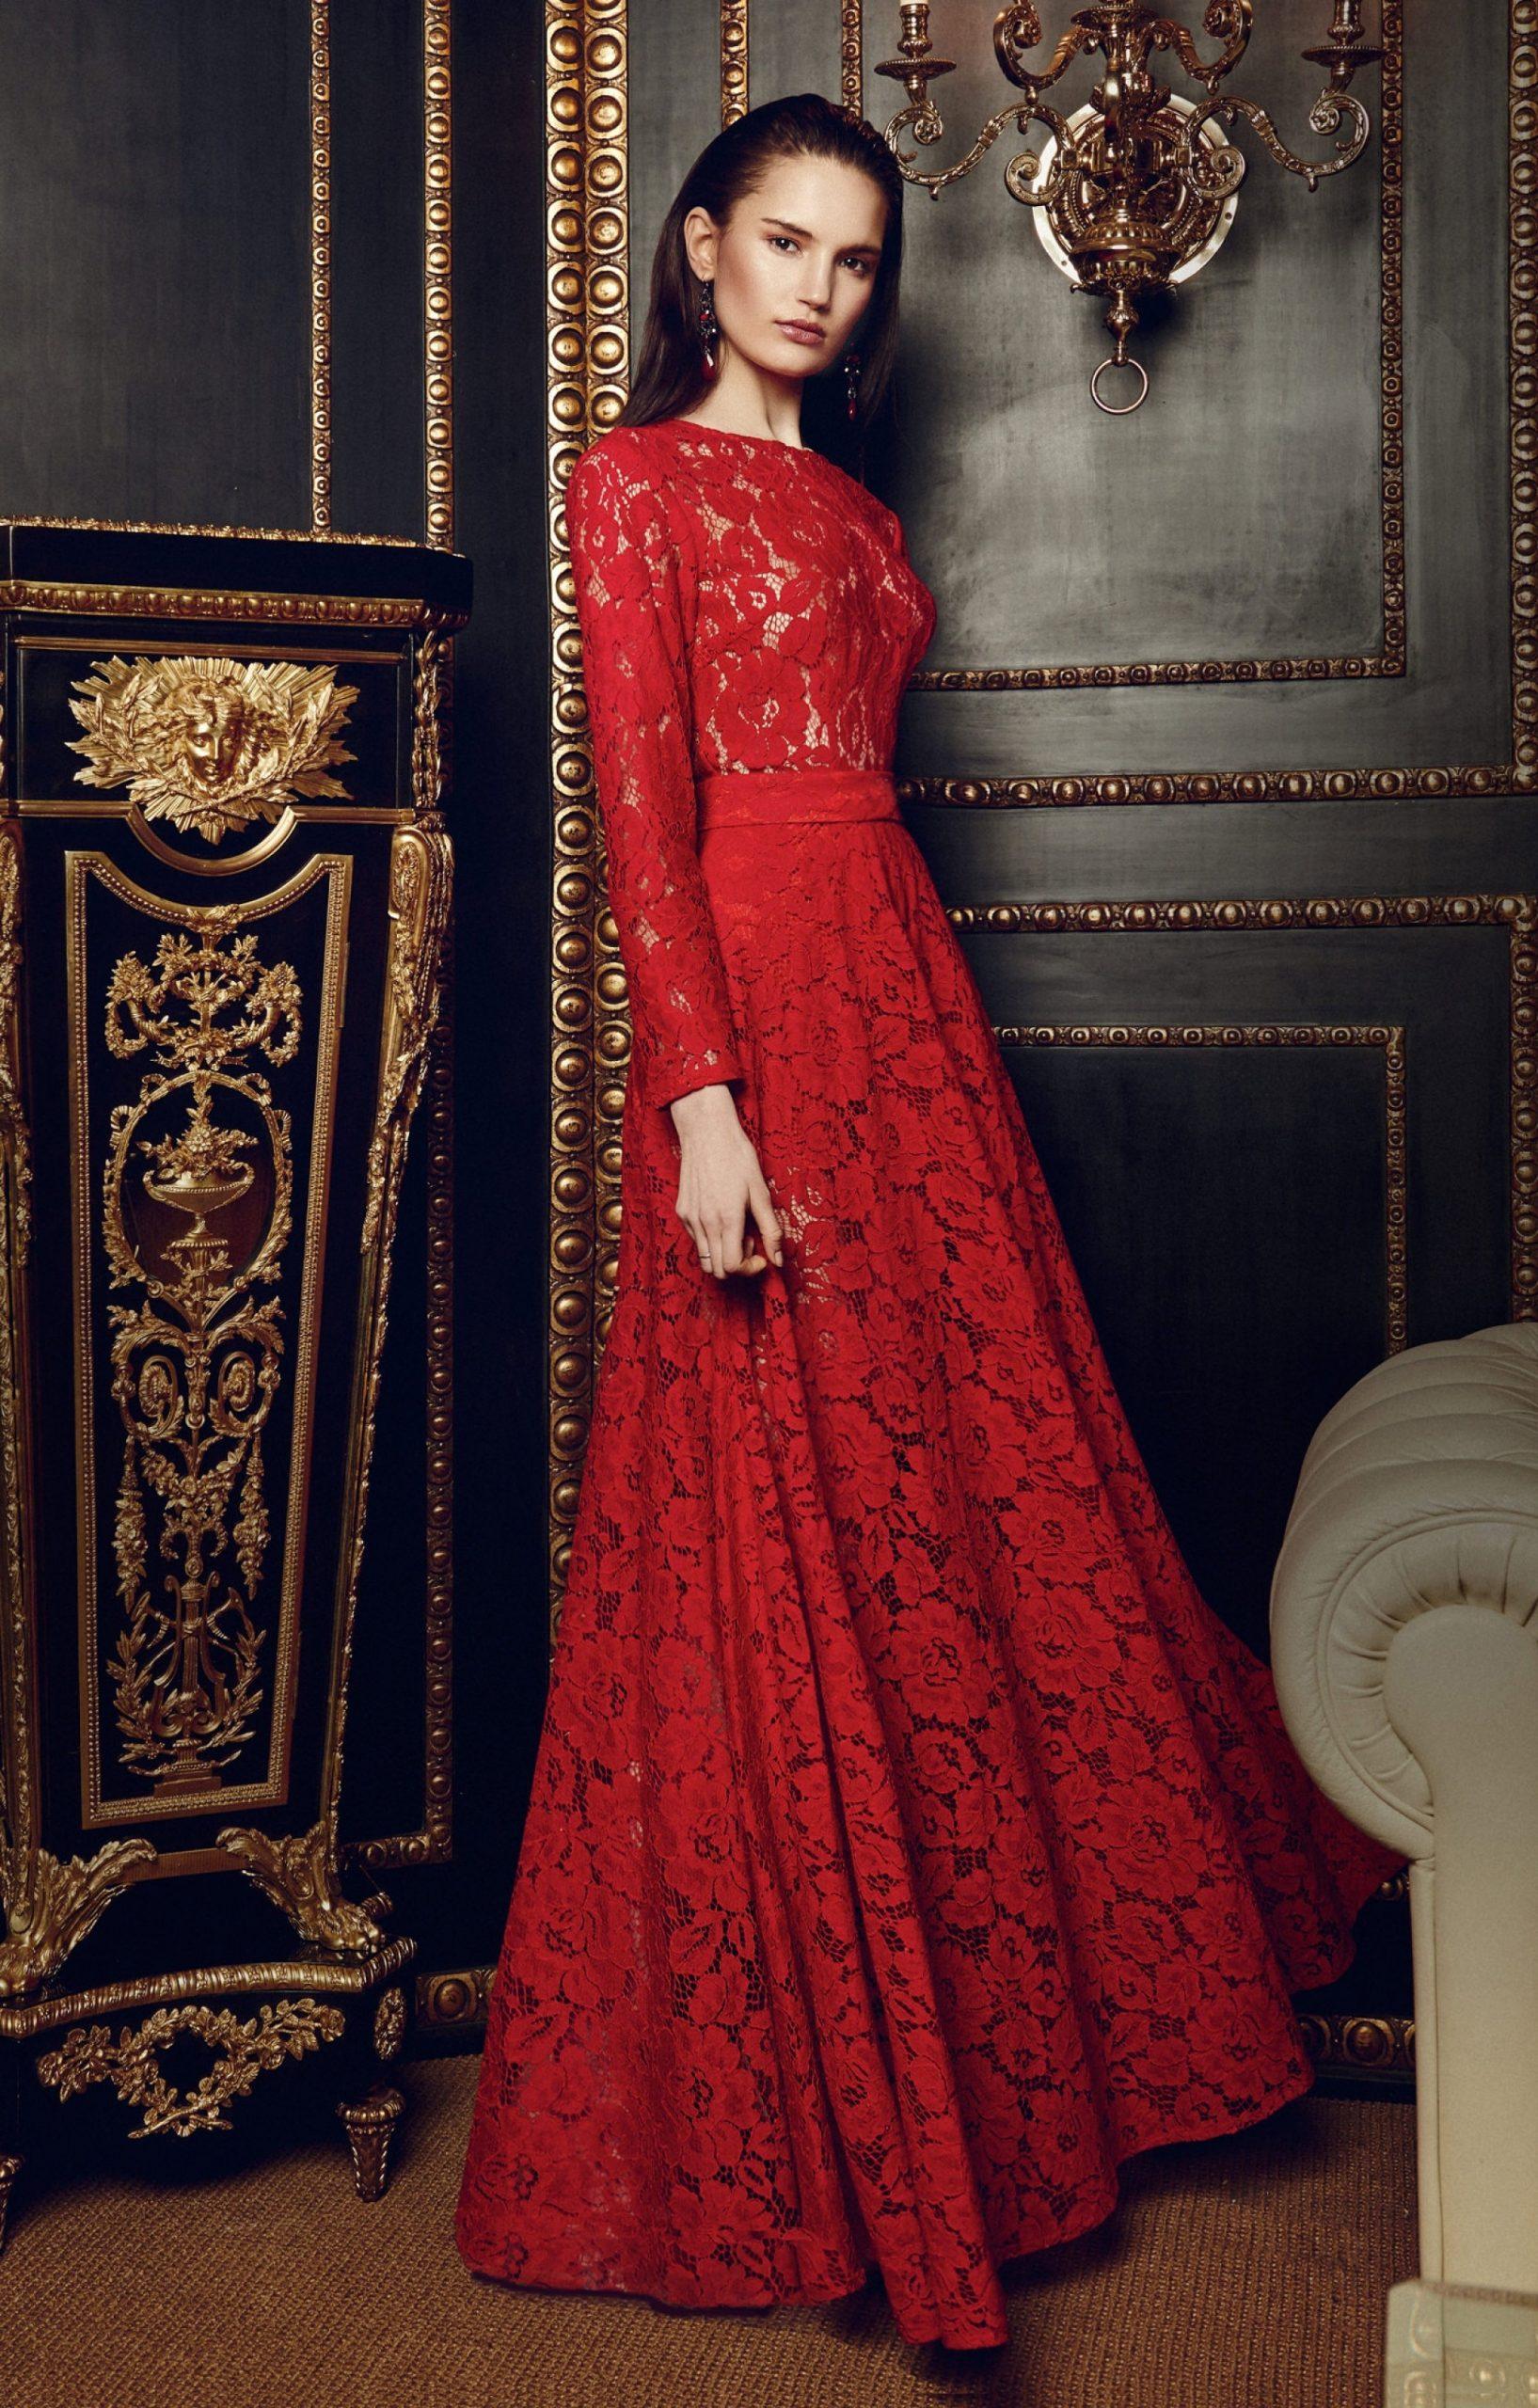 17 Spektakulär Designer Abendkleid ÄrmelFormal Fantastisch Designer Abendkleid Bester Preis